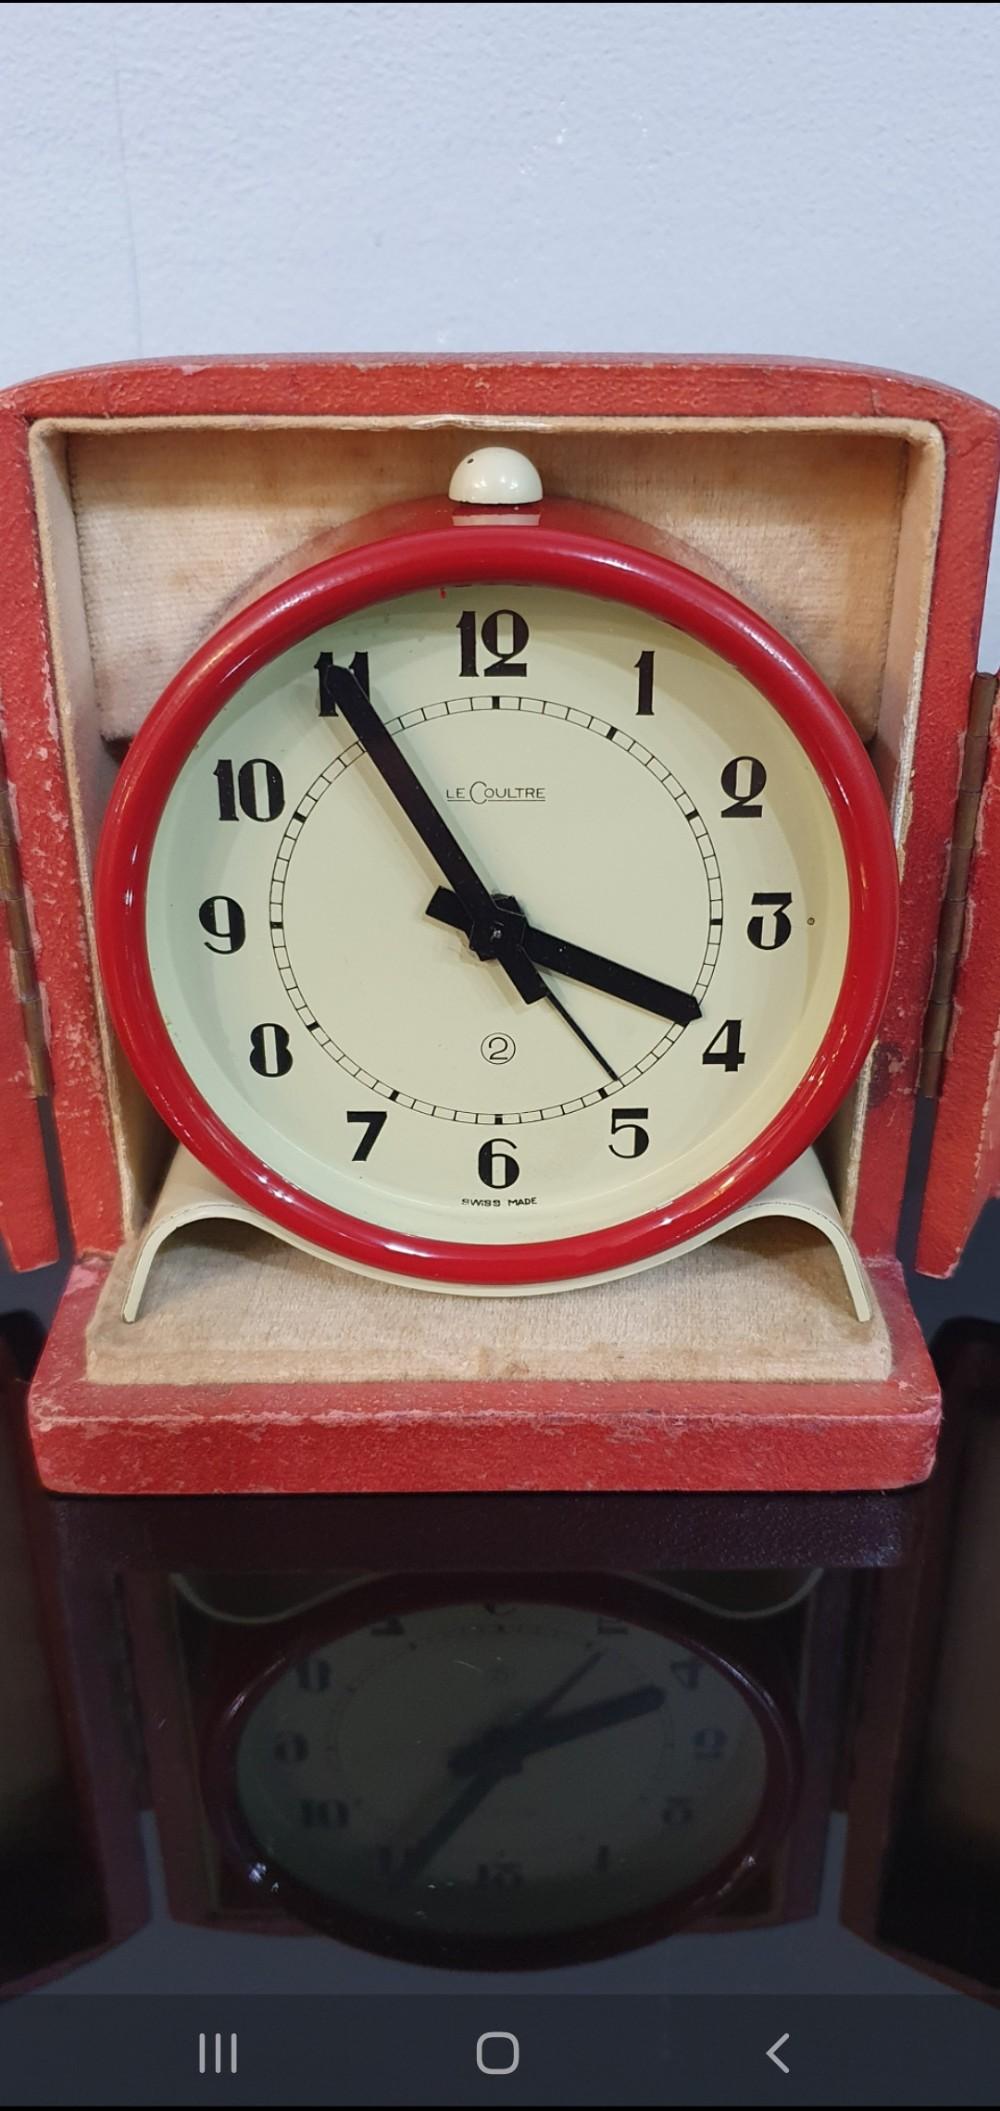 lecoultre clock 1920s art deco pre jaegerlecoultre 2 day alarm clock original red leather case serviced 12 mo guarantee